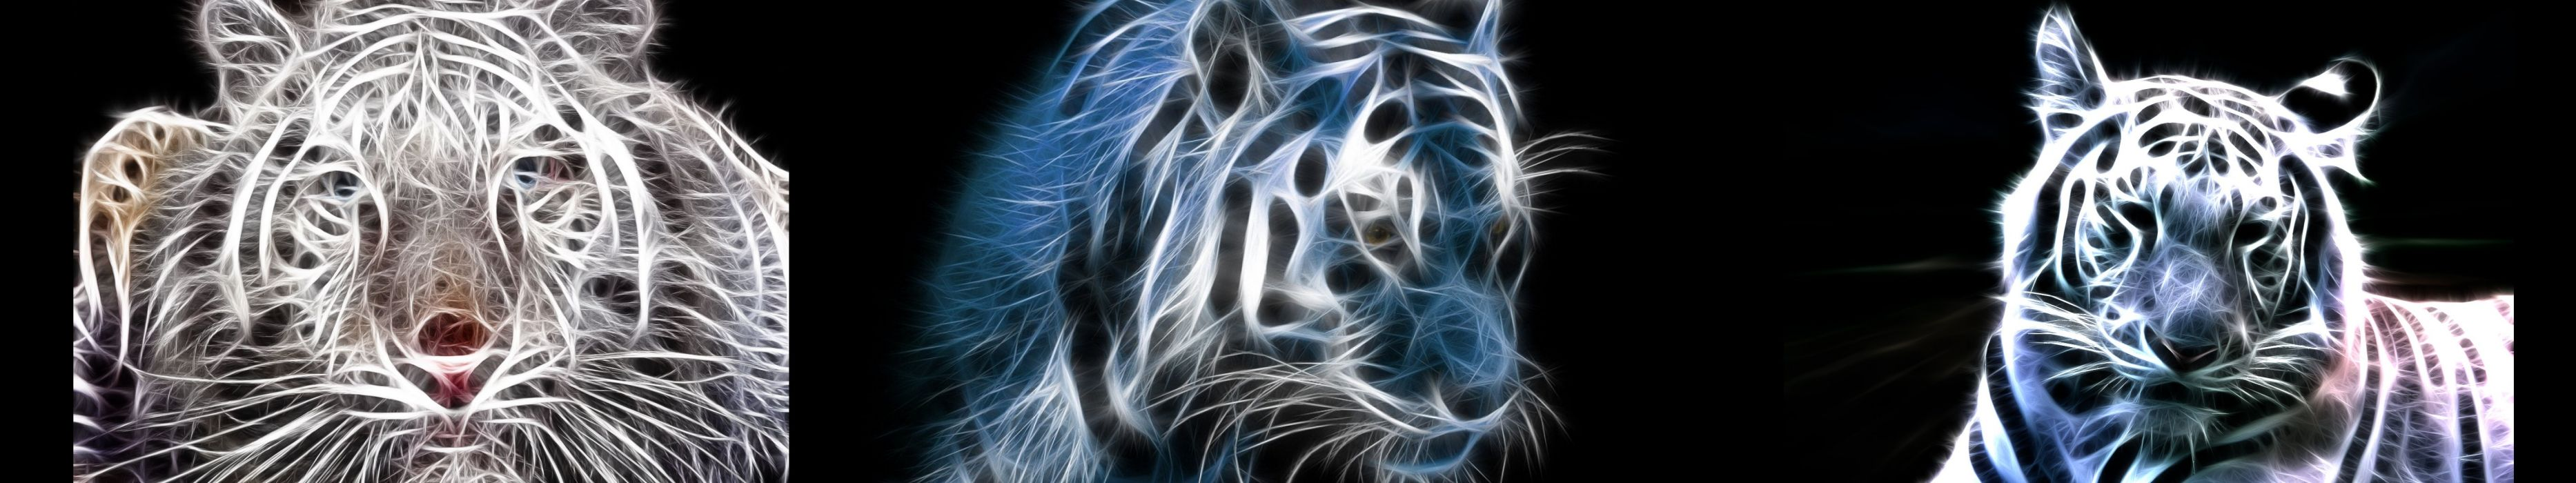 wallpaper triple multi multiple screen monitor animal light tiger wallpaper